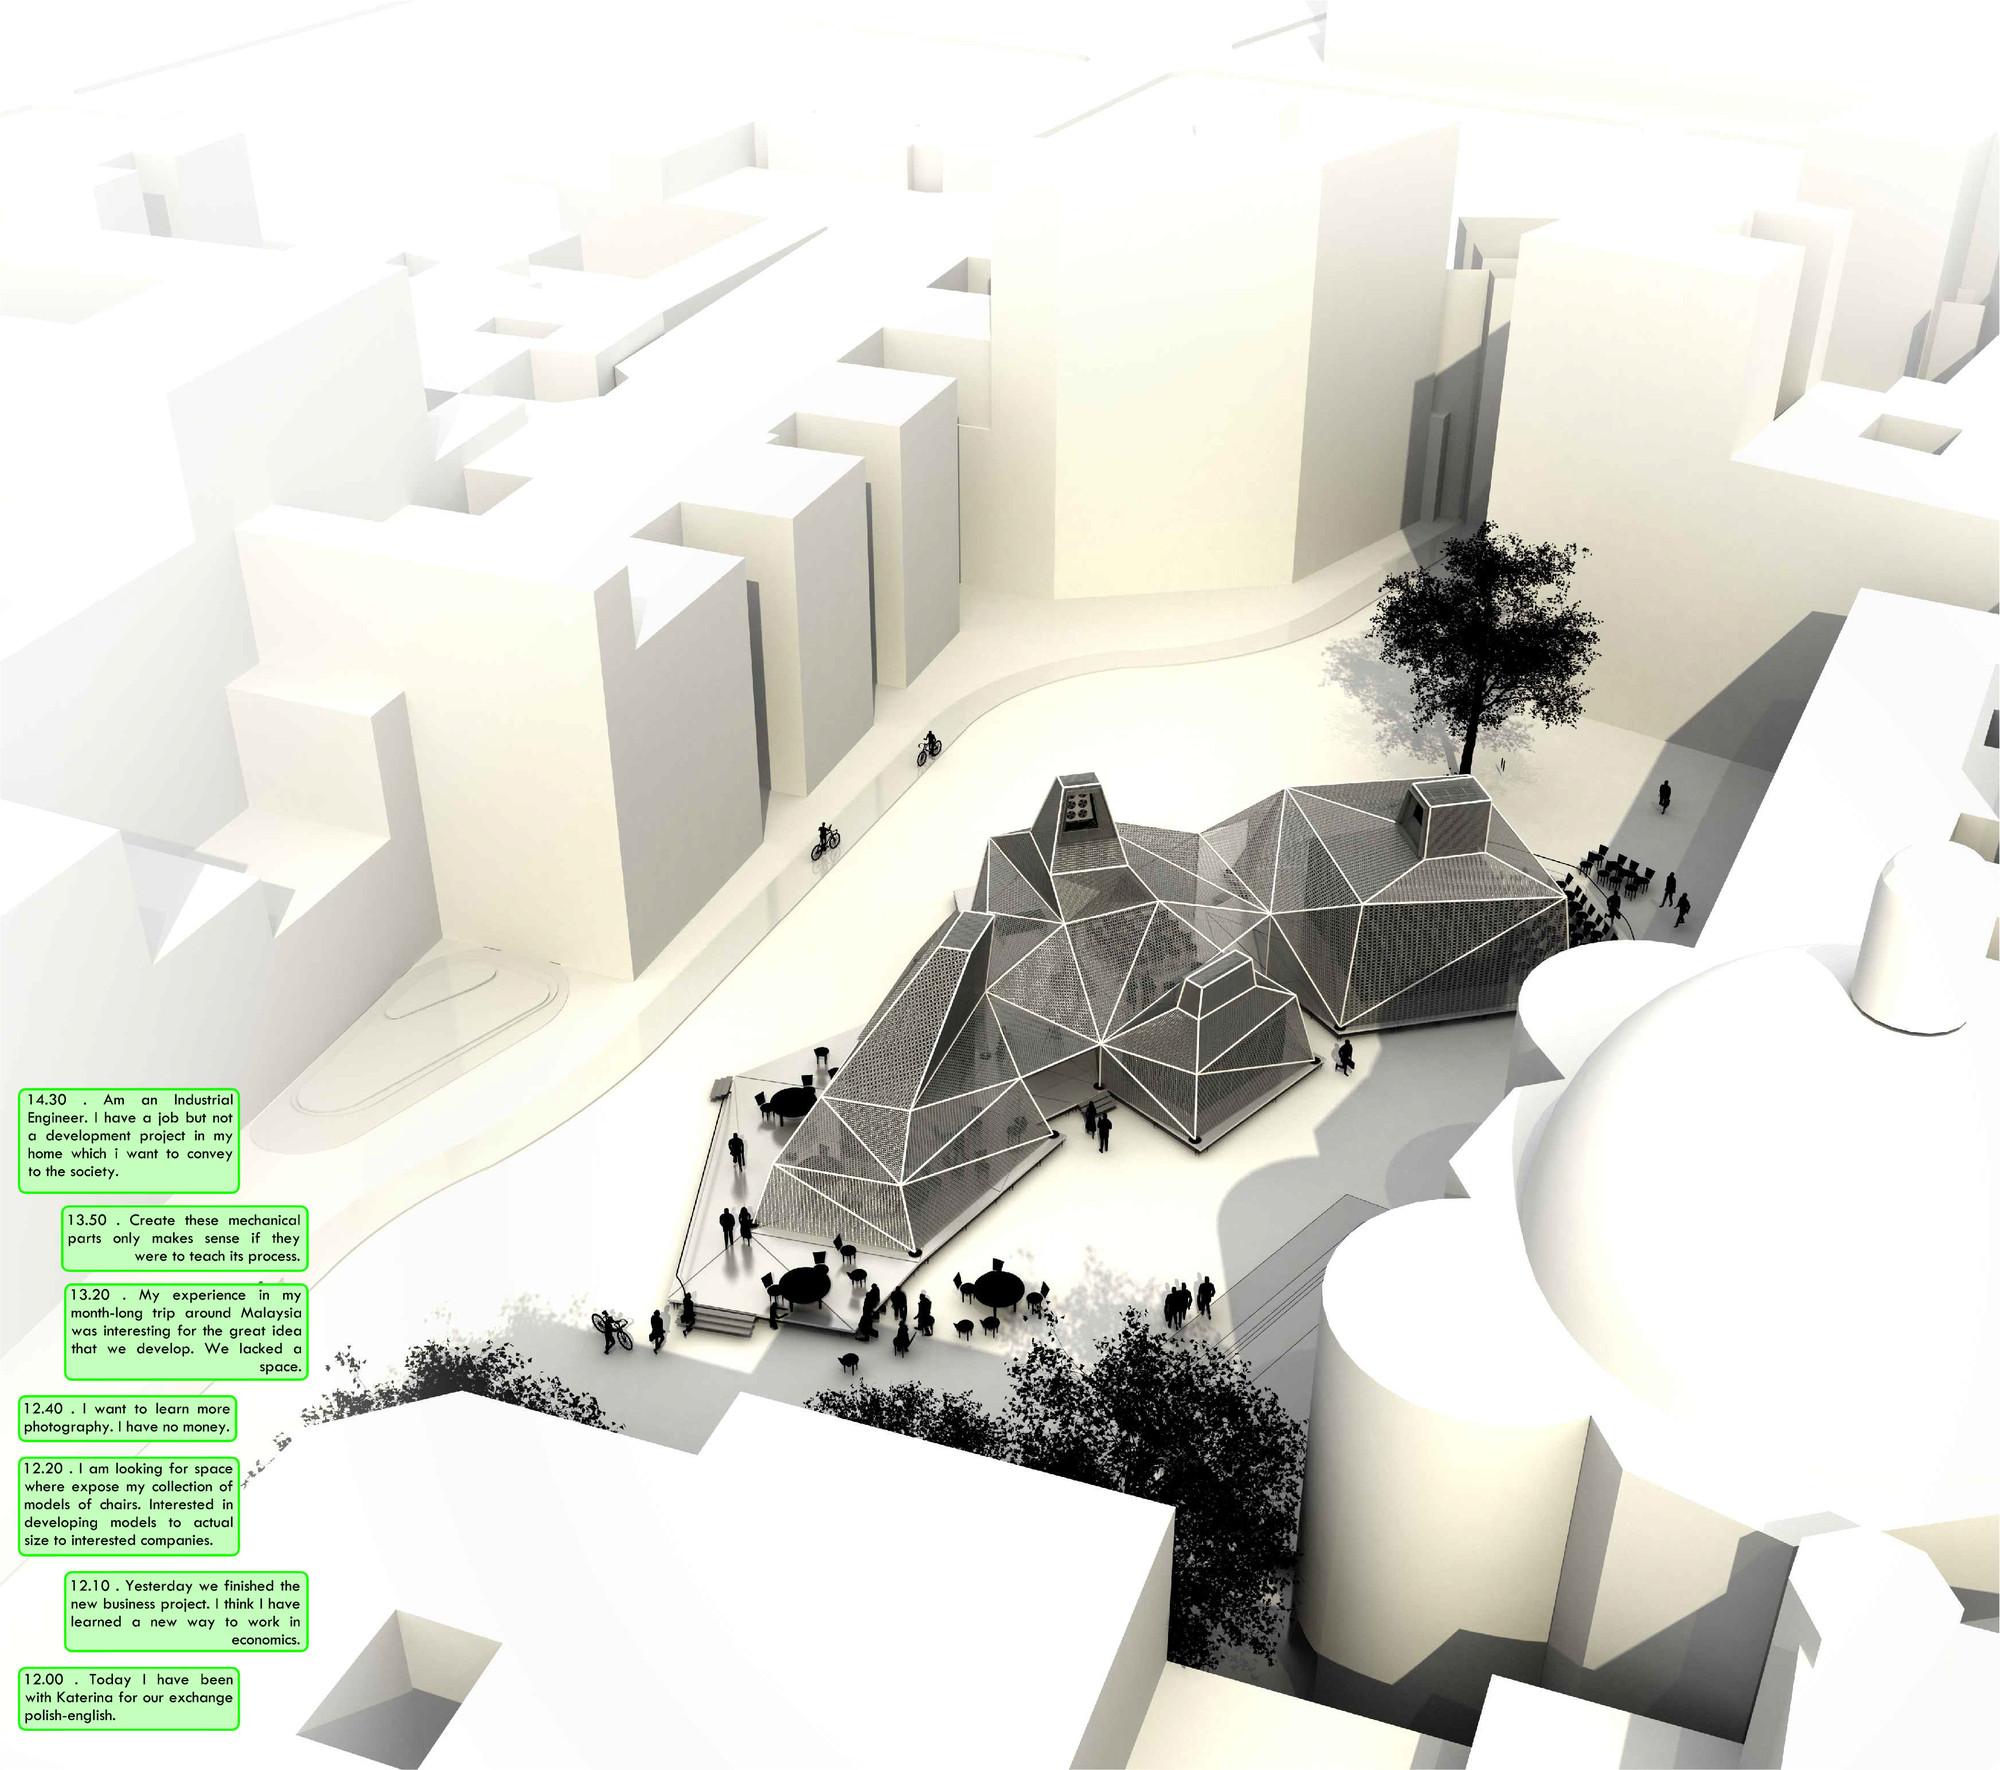 Tangram, Primer Lugar en Holcim Awards Next Generation Europe 2014 / España, Cortesia de DAT Pangea